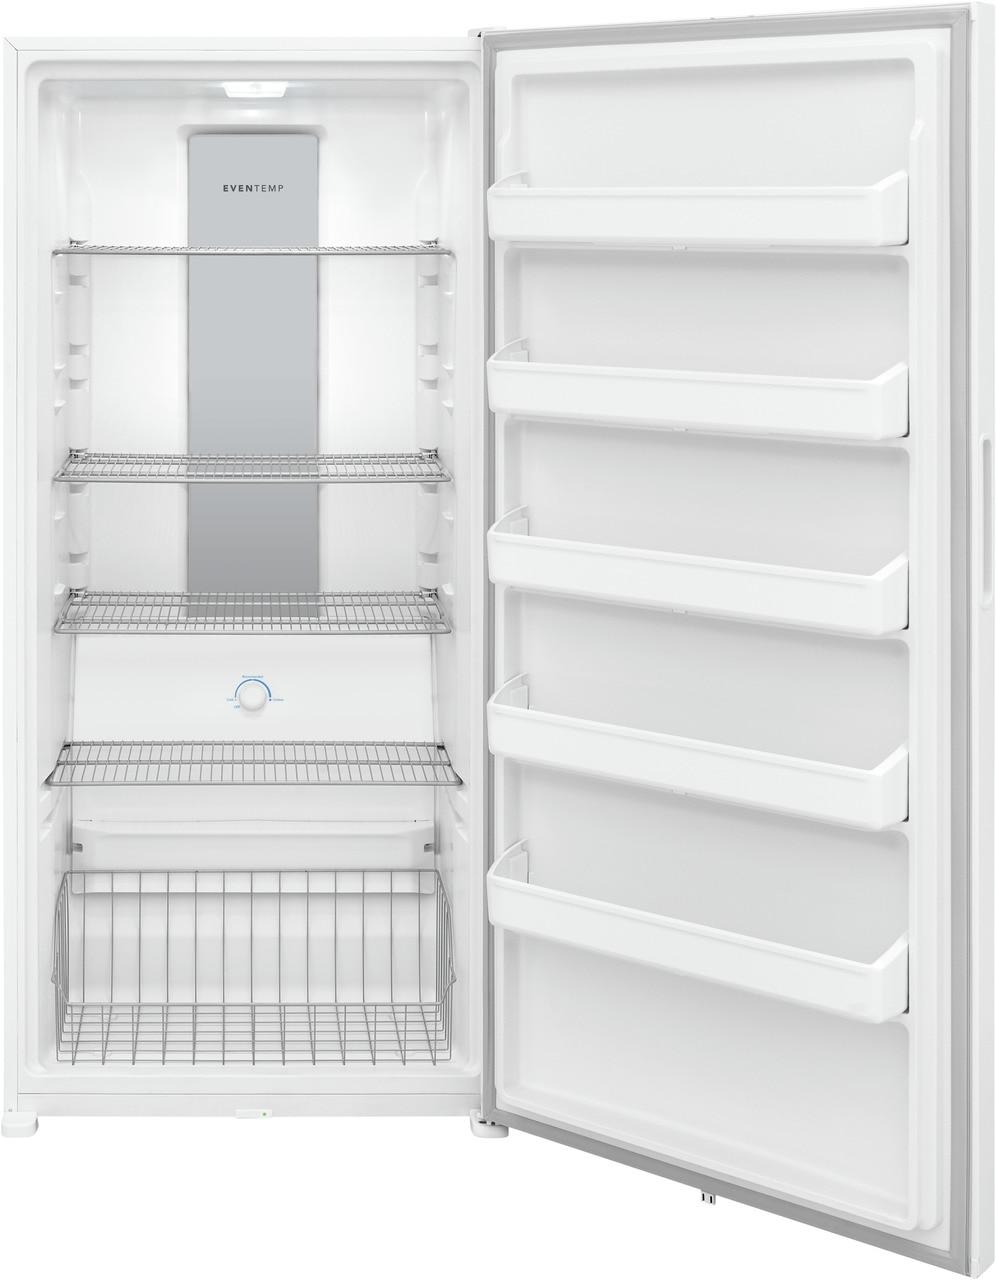 Model: FFFU20F2VW | Frigidaire 20.0 Cu. Ft Upright Freezer